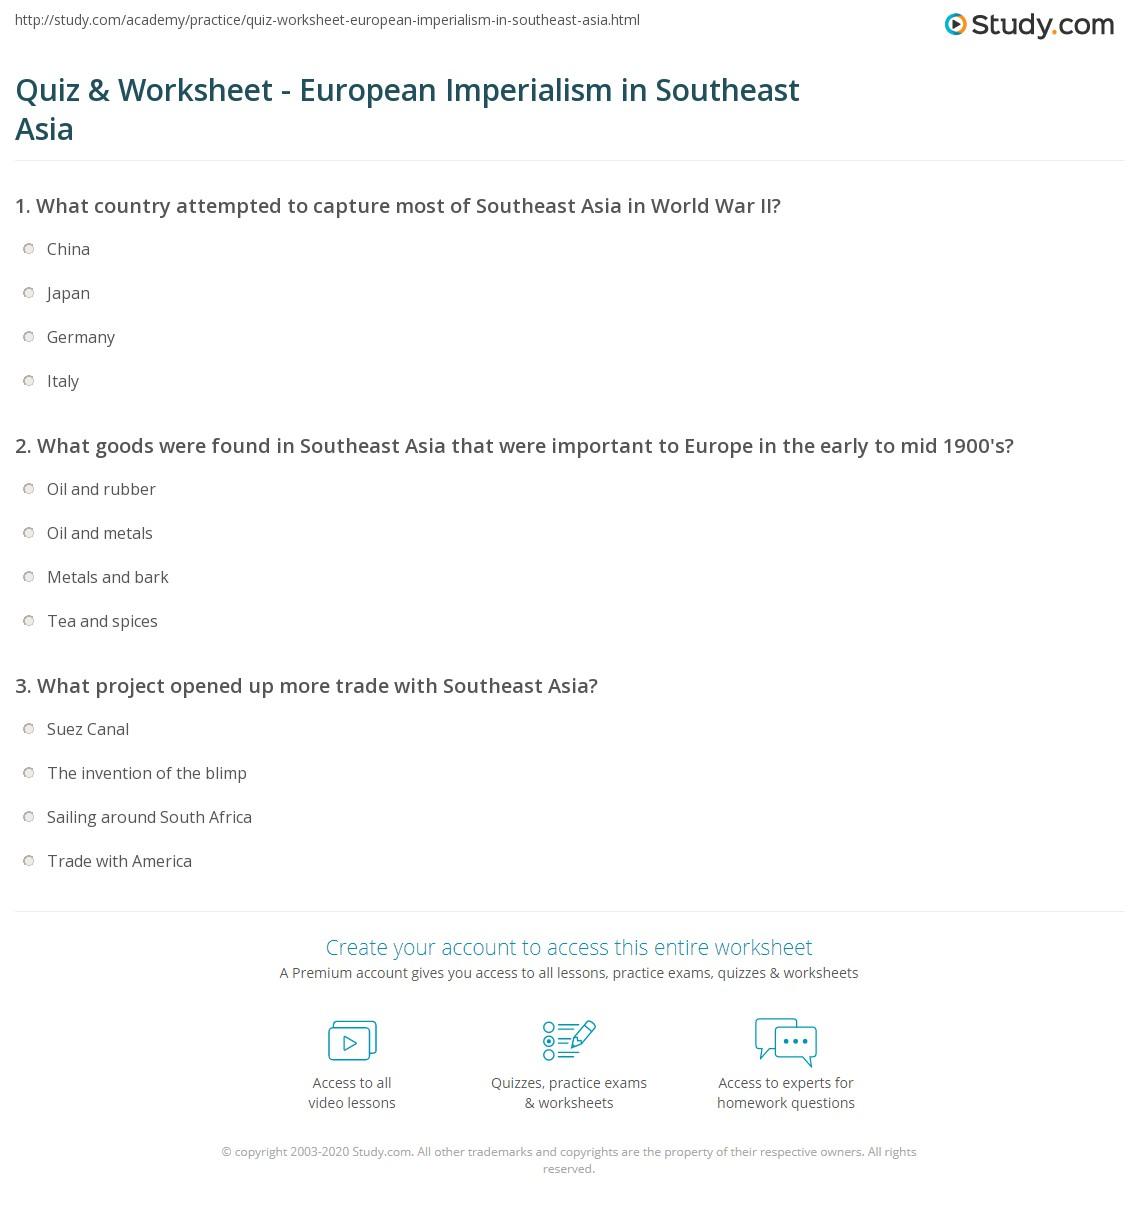 Print Economic Motives For European Colonization Of Southeast Asia Worksheet